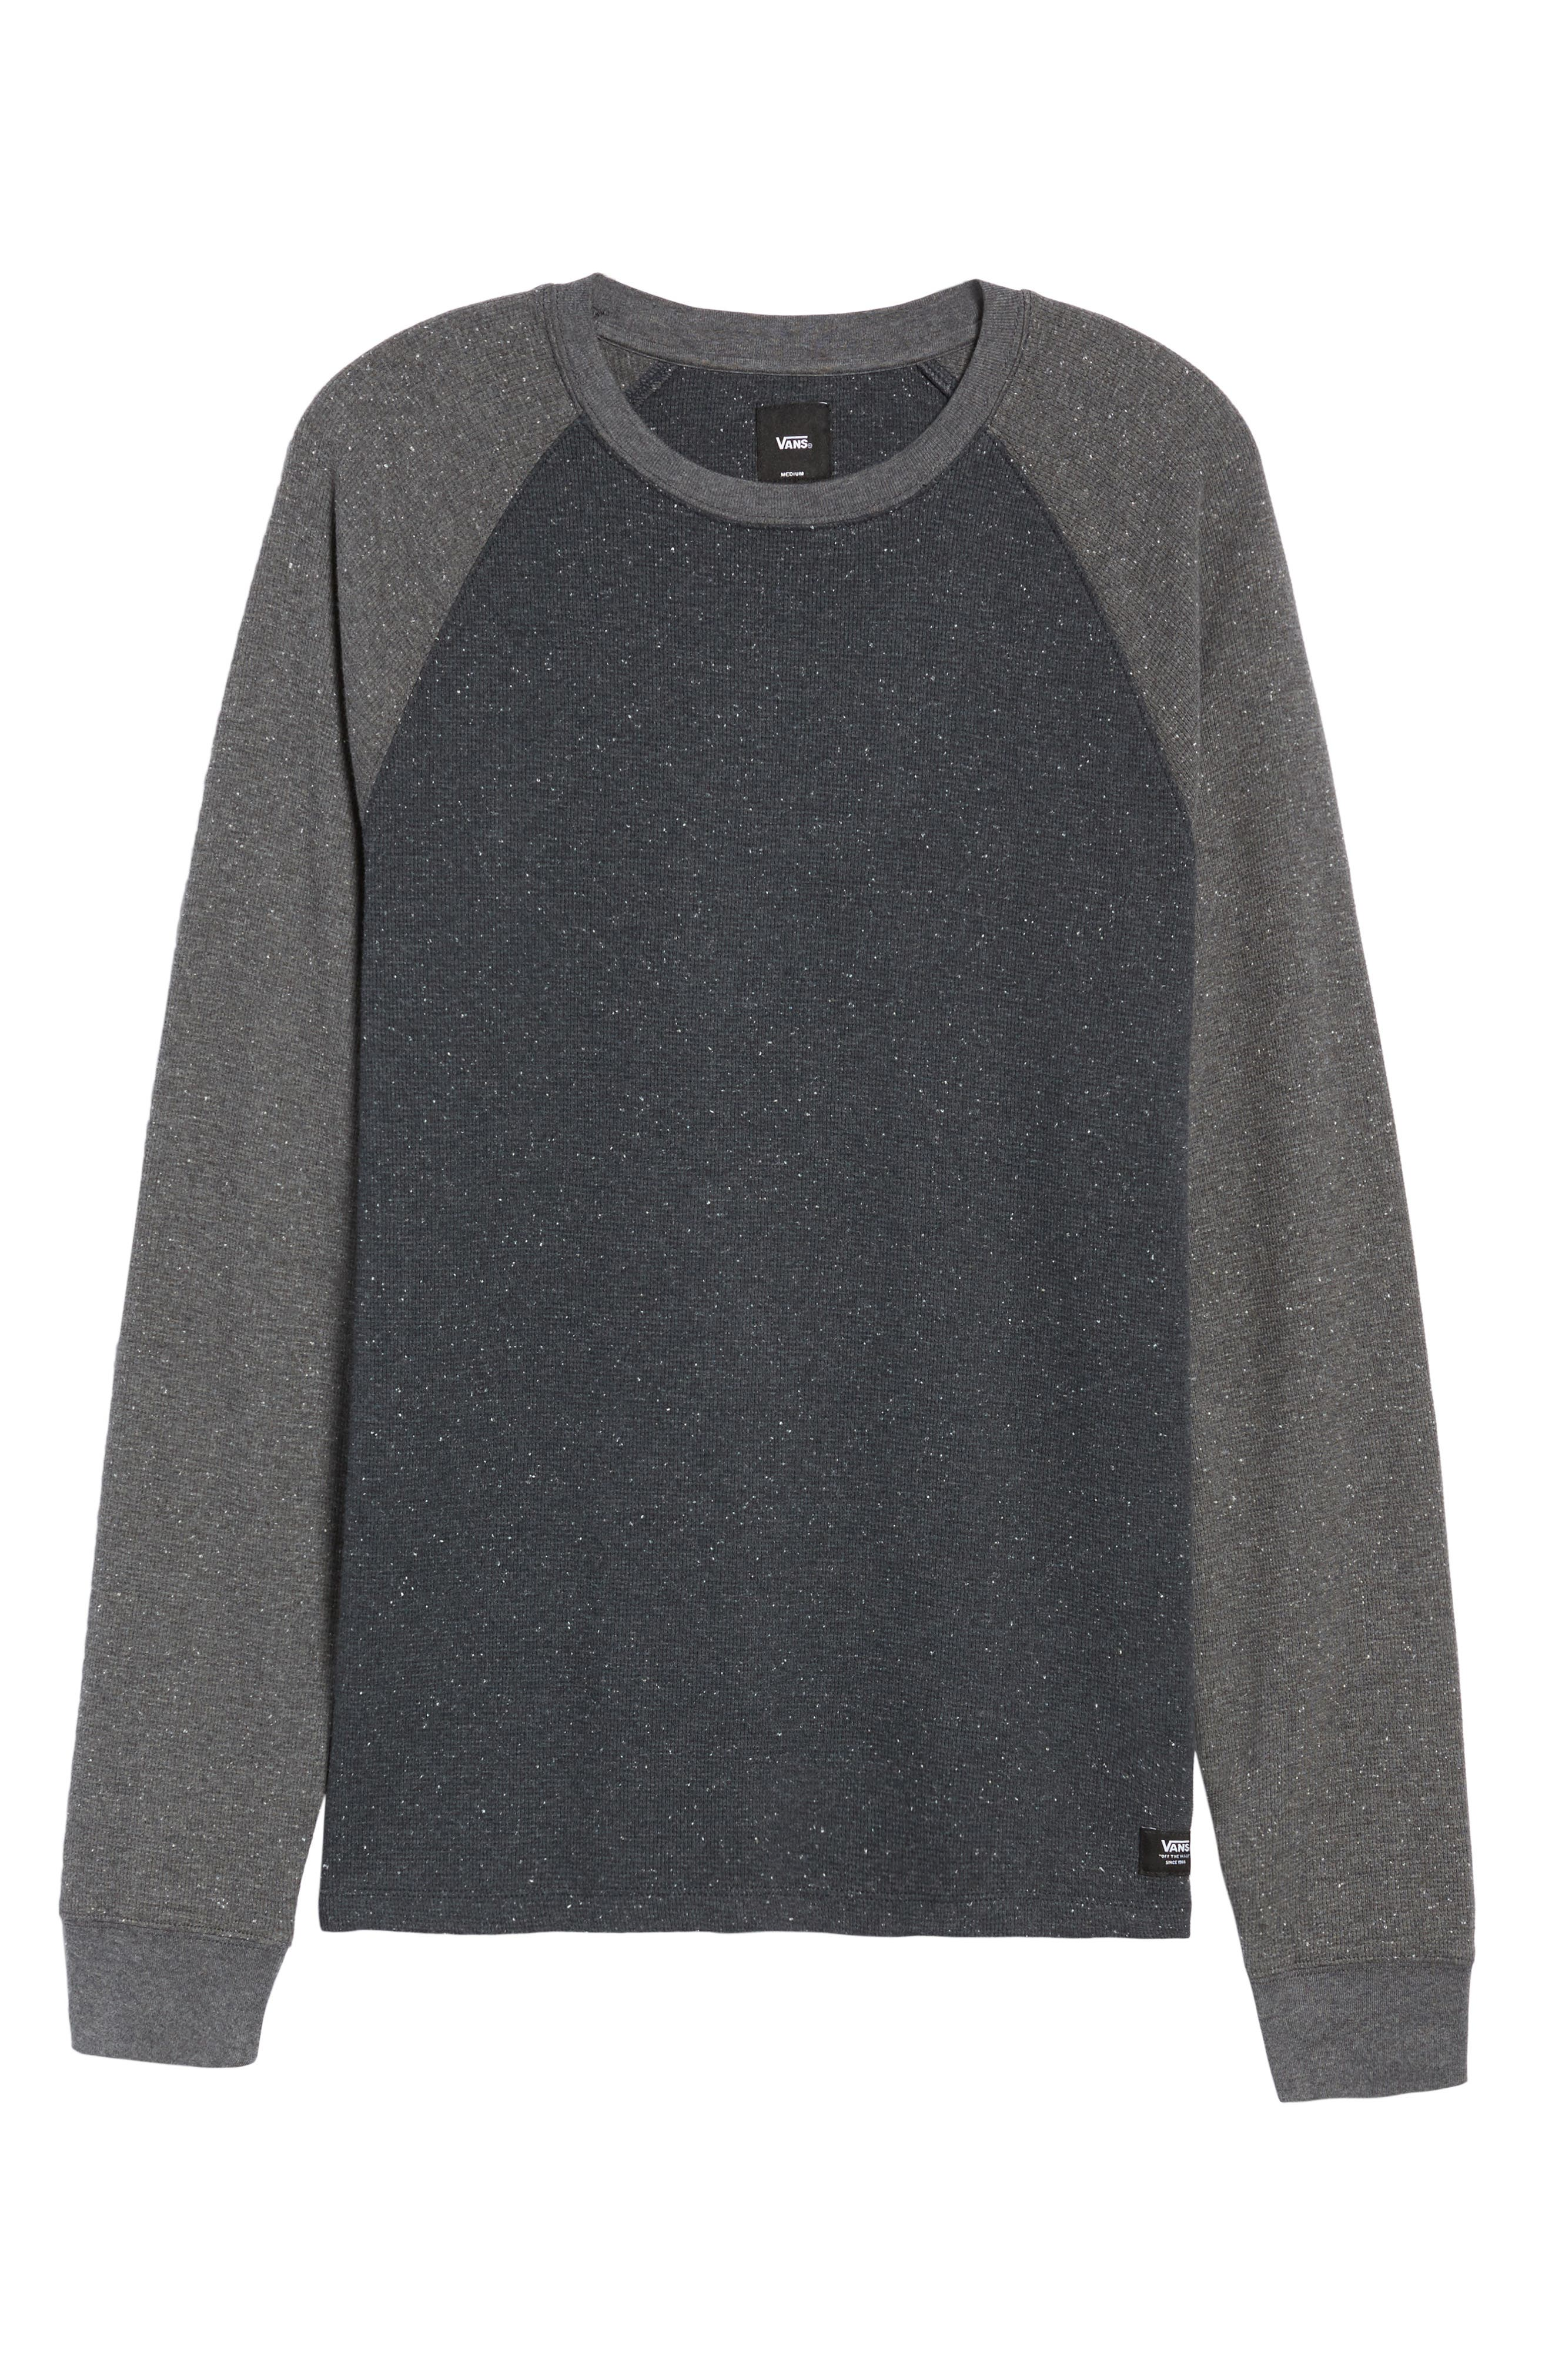 Burdett Thermal T-Shirt,                             Alternate thumbnail 6, color,                             001